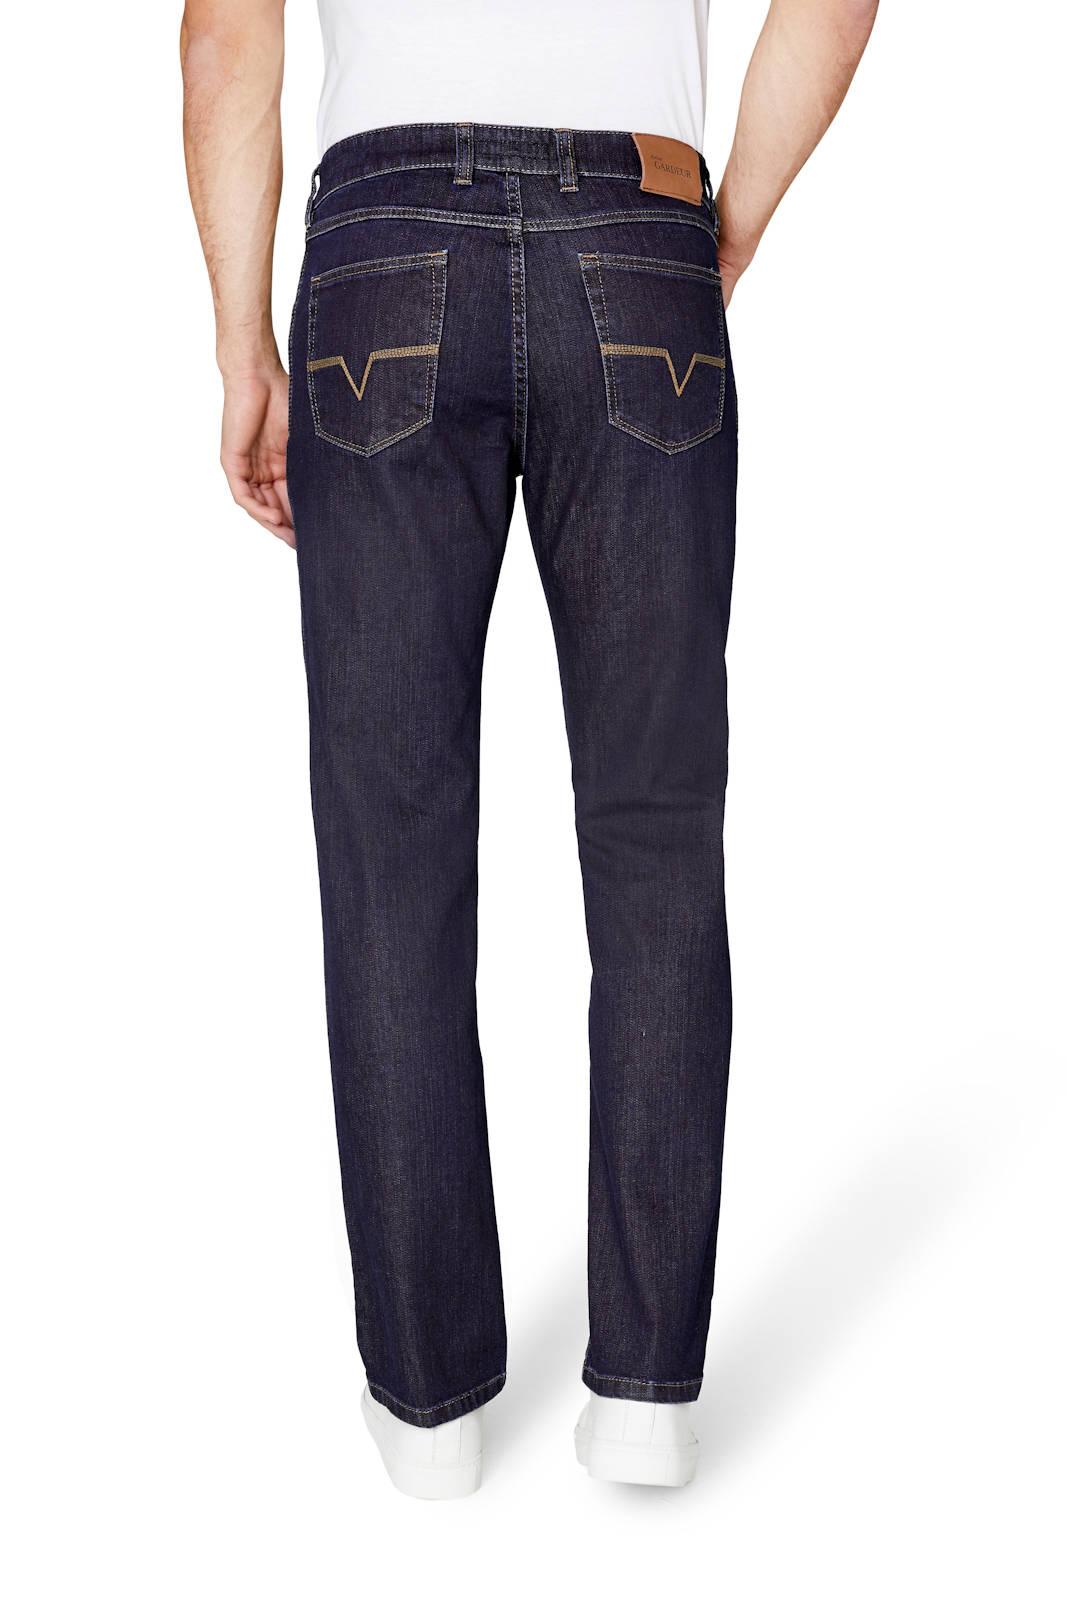 Atelier-GARDEUR-Jeans-NEVIO-11-Regular-Fit-Herren-Hose-Straight-Leg-Denim-NEU Indexbild 4